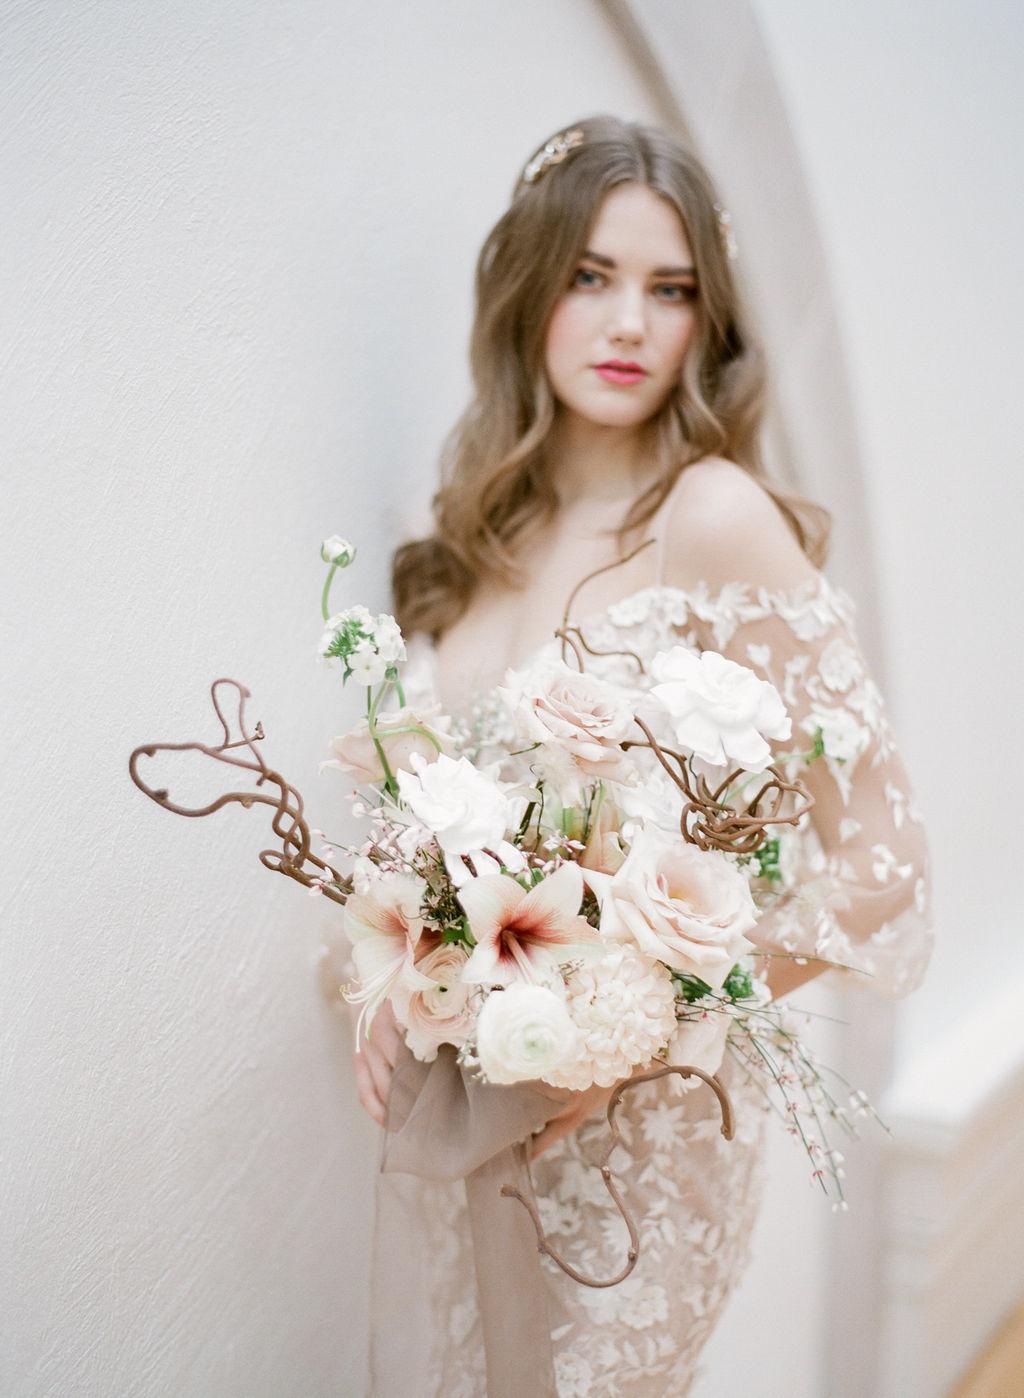 artiese-ago-wedding-editorial-000423700003.jpg